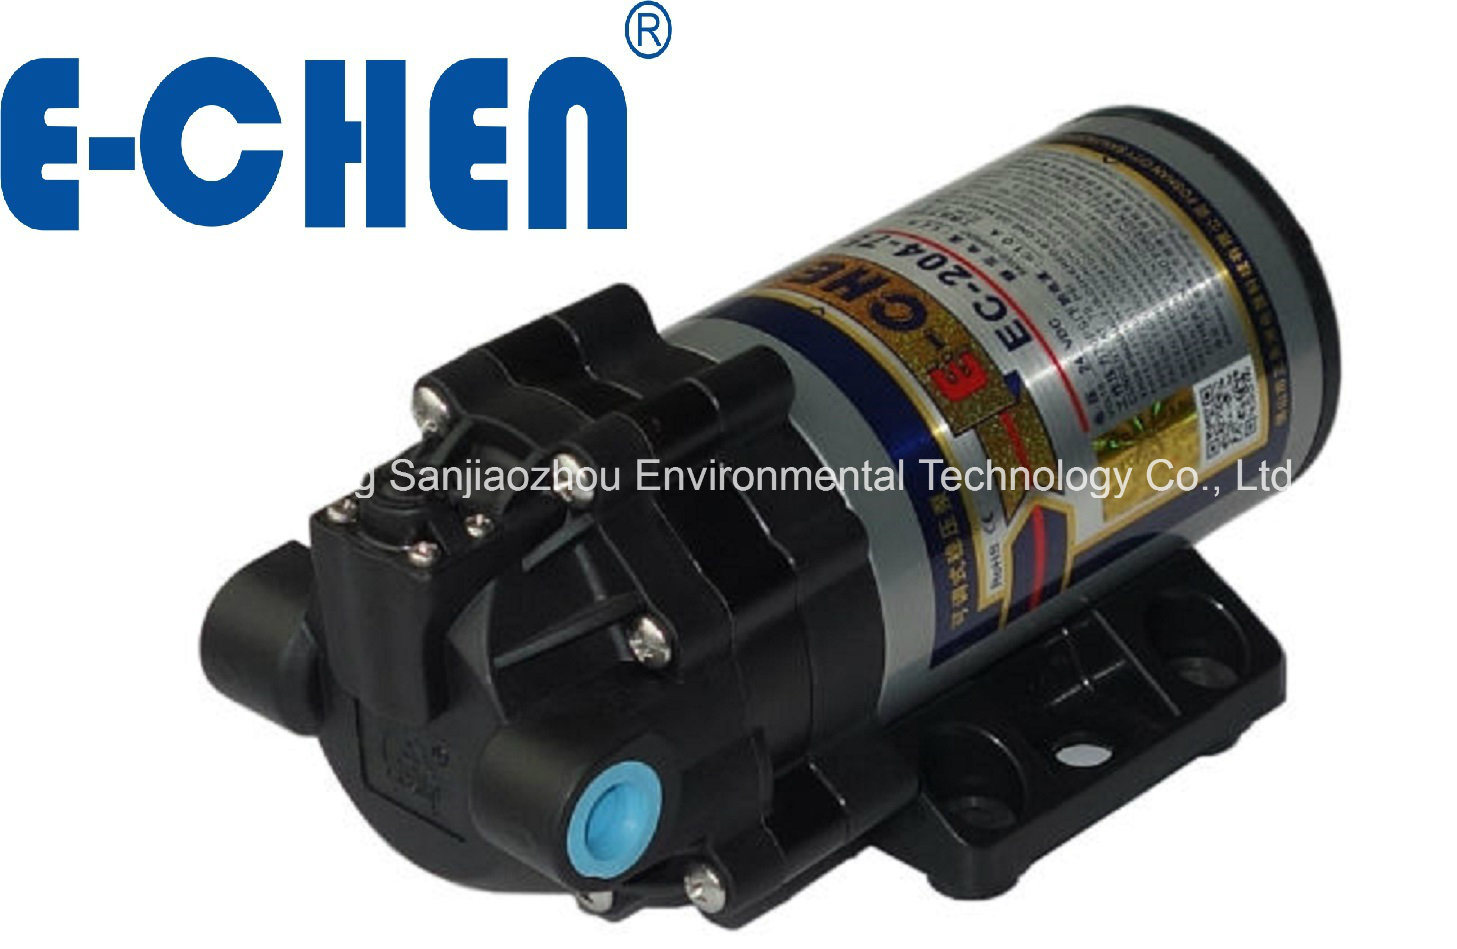 E-Chen 204 Series 300gpd Diaphragm RO Booster Pump - Self Priming Self Pressure Regulating Water Pump